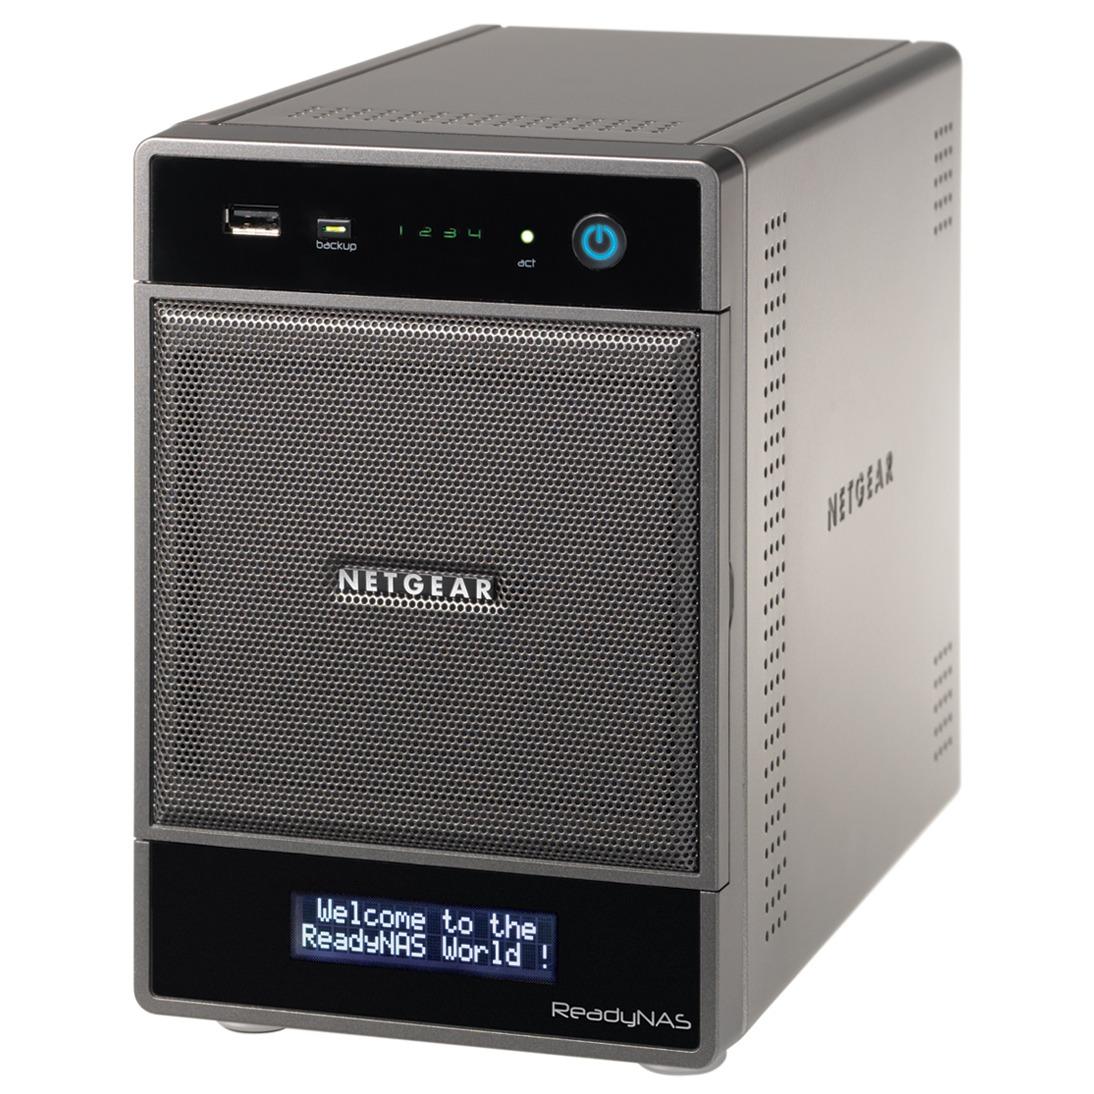 Serveur NAS Netgear ReadyNAS Ultra 4 baies Serveur NAS multimédia 4 baies (sans disque dur)